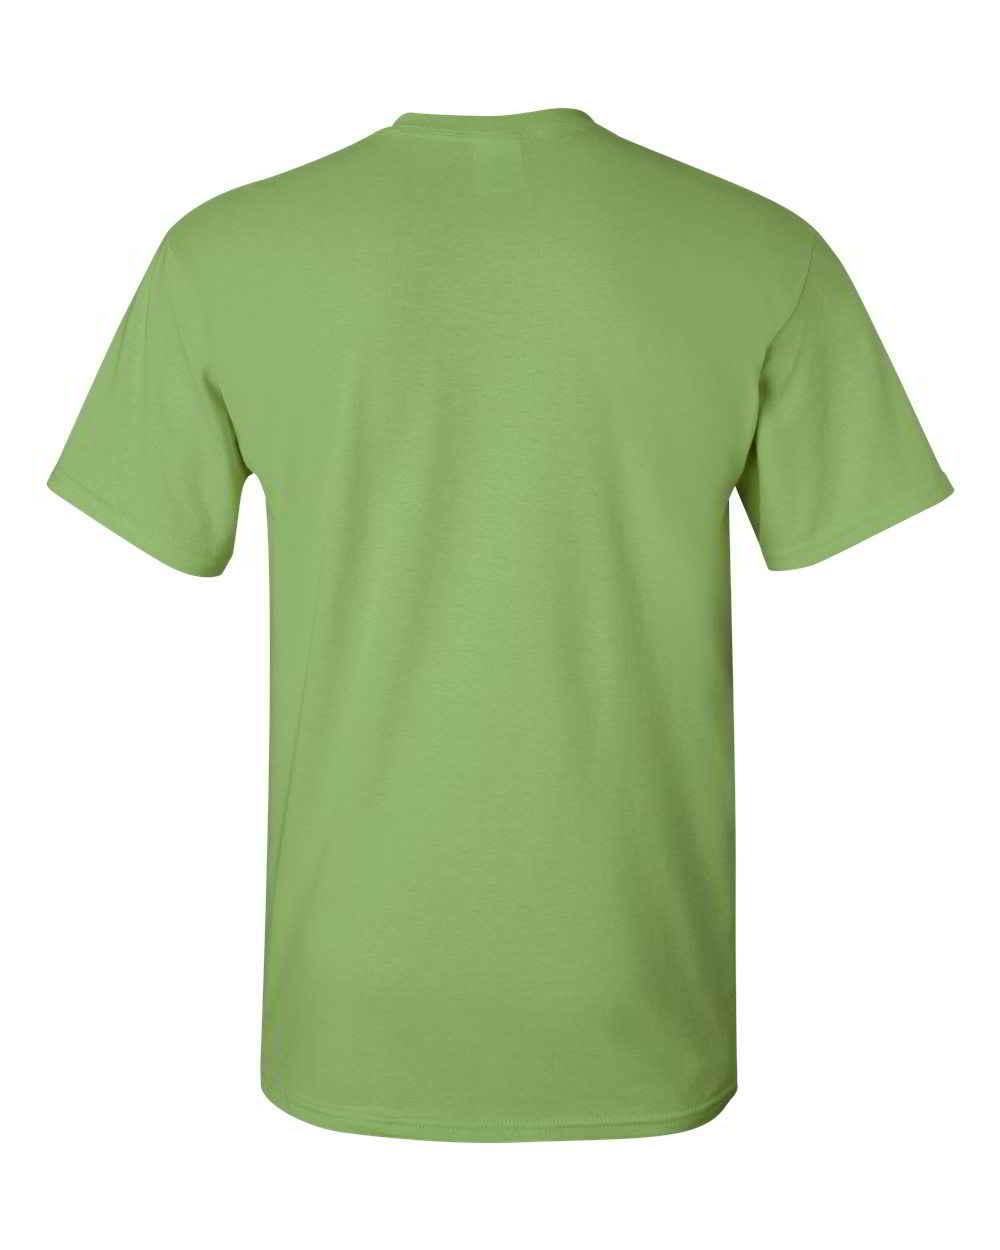 Gildan-Heavy-Cotton-Short-Sleeve-Mens-Green-T-Shirts-5000 thumbnail 17